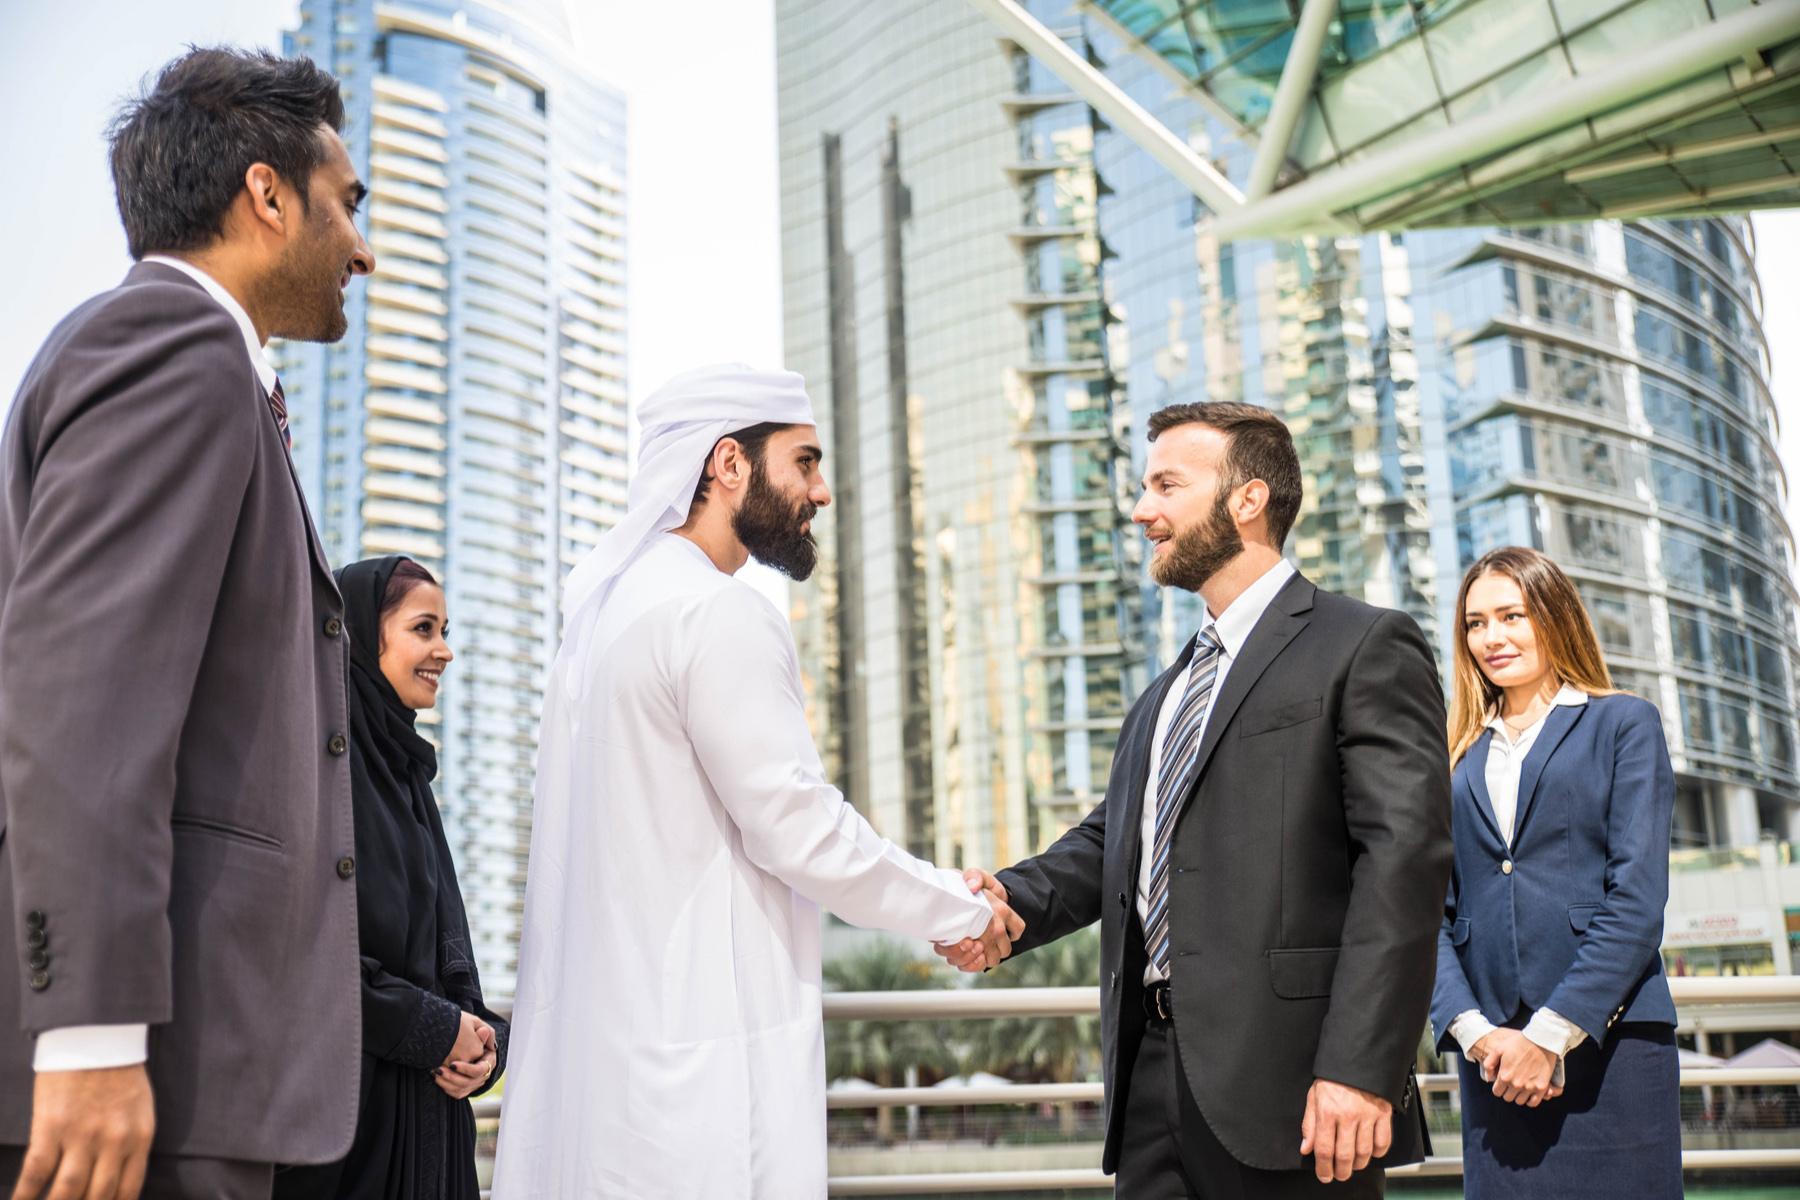 Business associates in Dubai